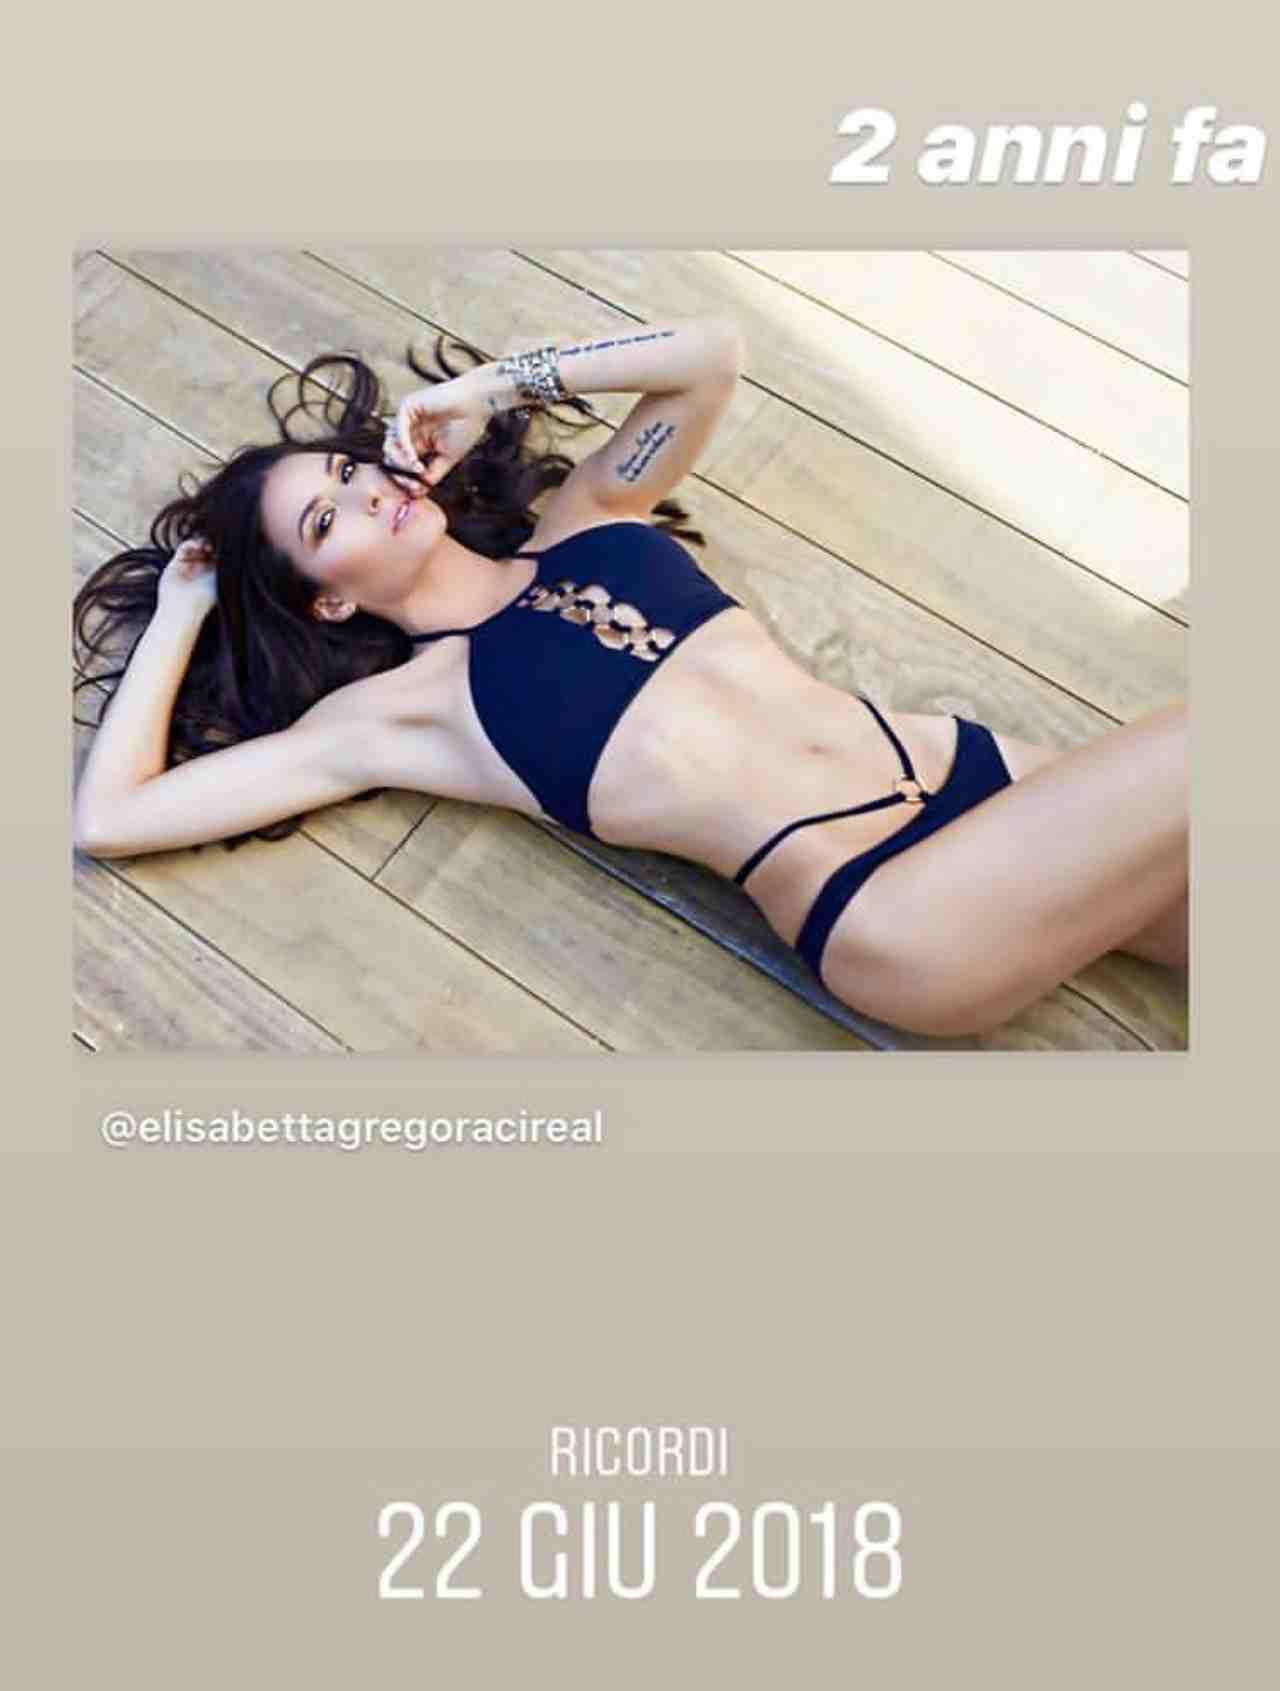 Elisabetta Gregoraci, foto ricordo in costume per i fan (Instagram)